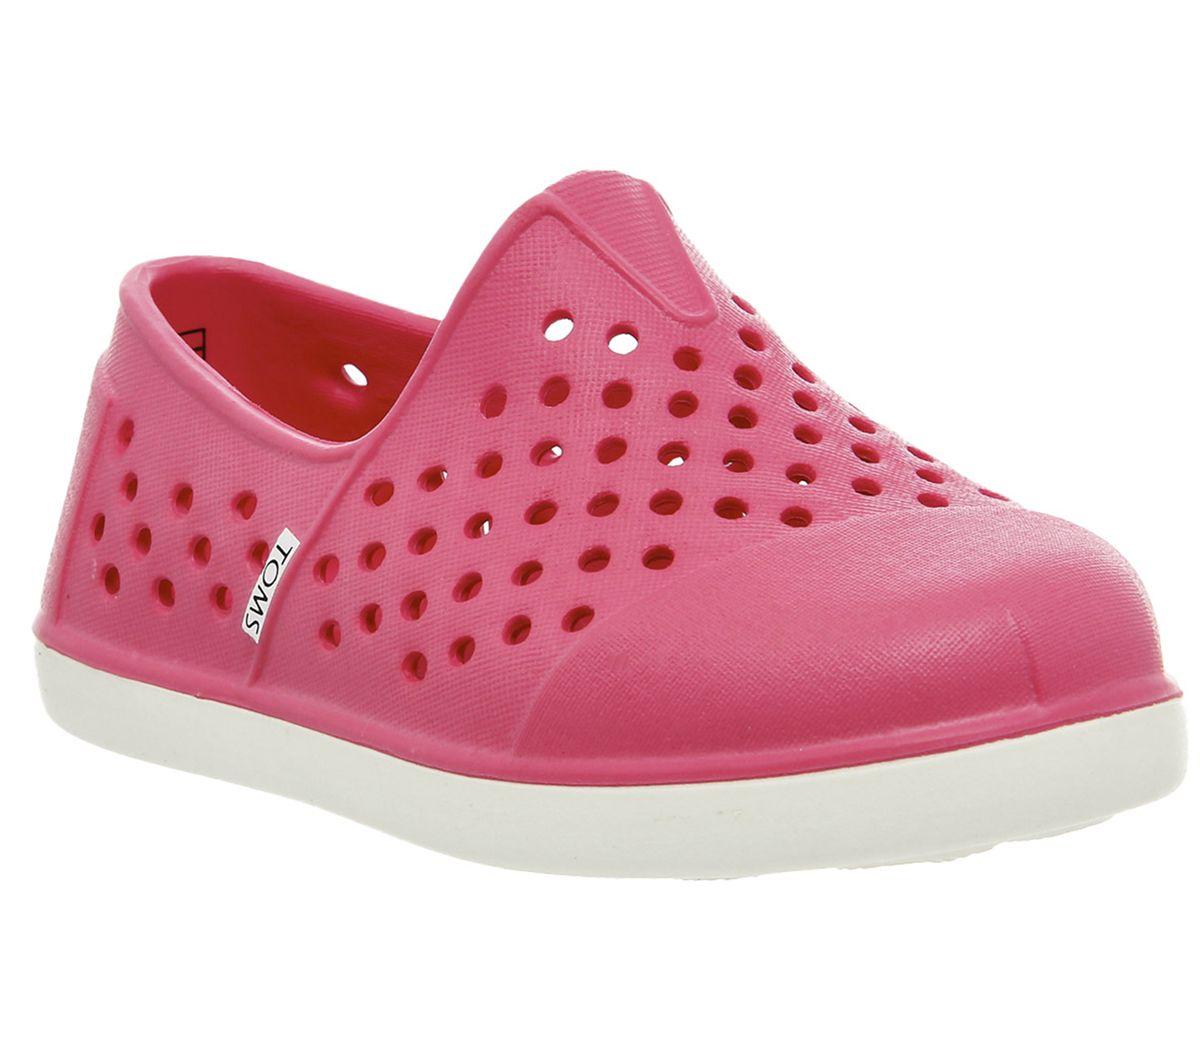 8a9cb8f9394 Toms Romper Pink - Unisex